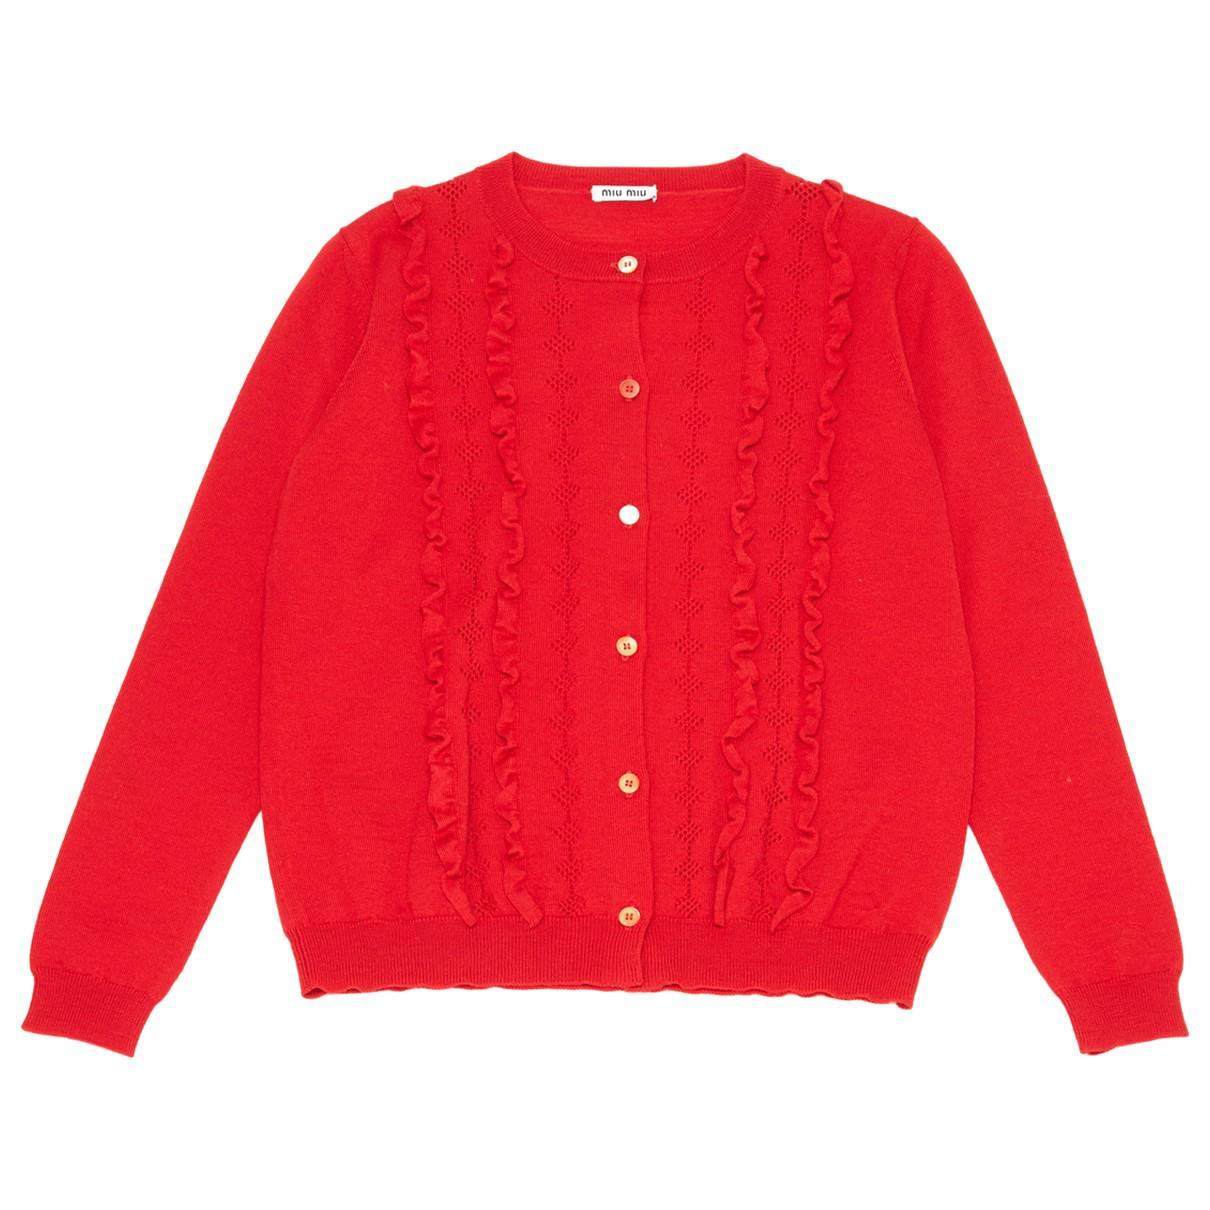 9f0be3c8592 Lyst - Miu Miu Pre-owned Wool Cardigan in Red